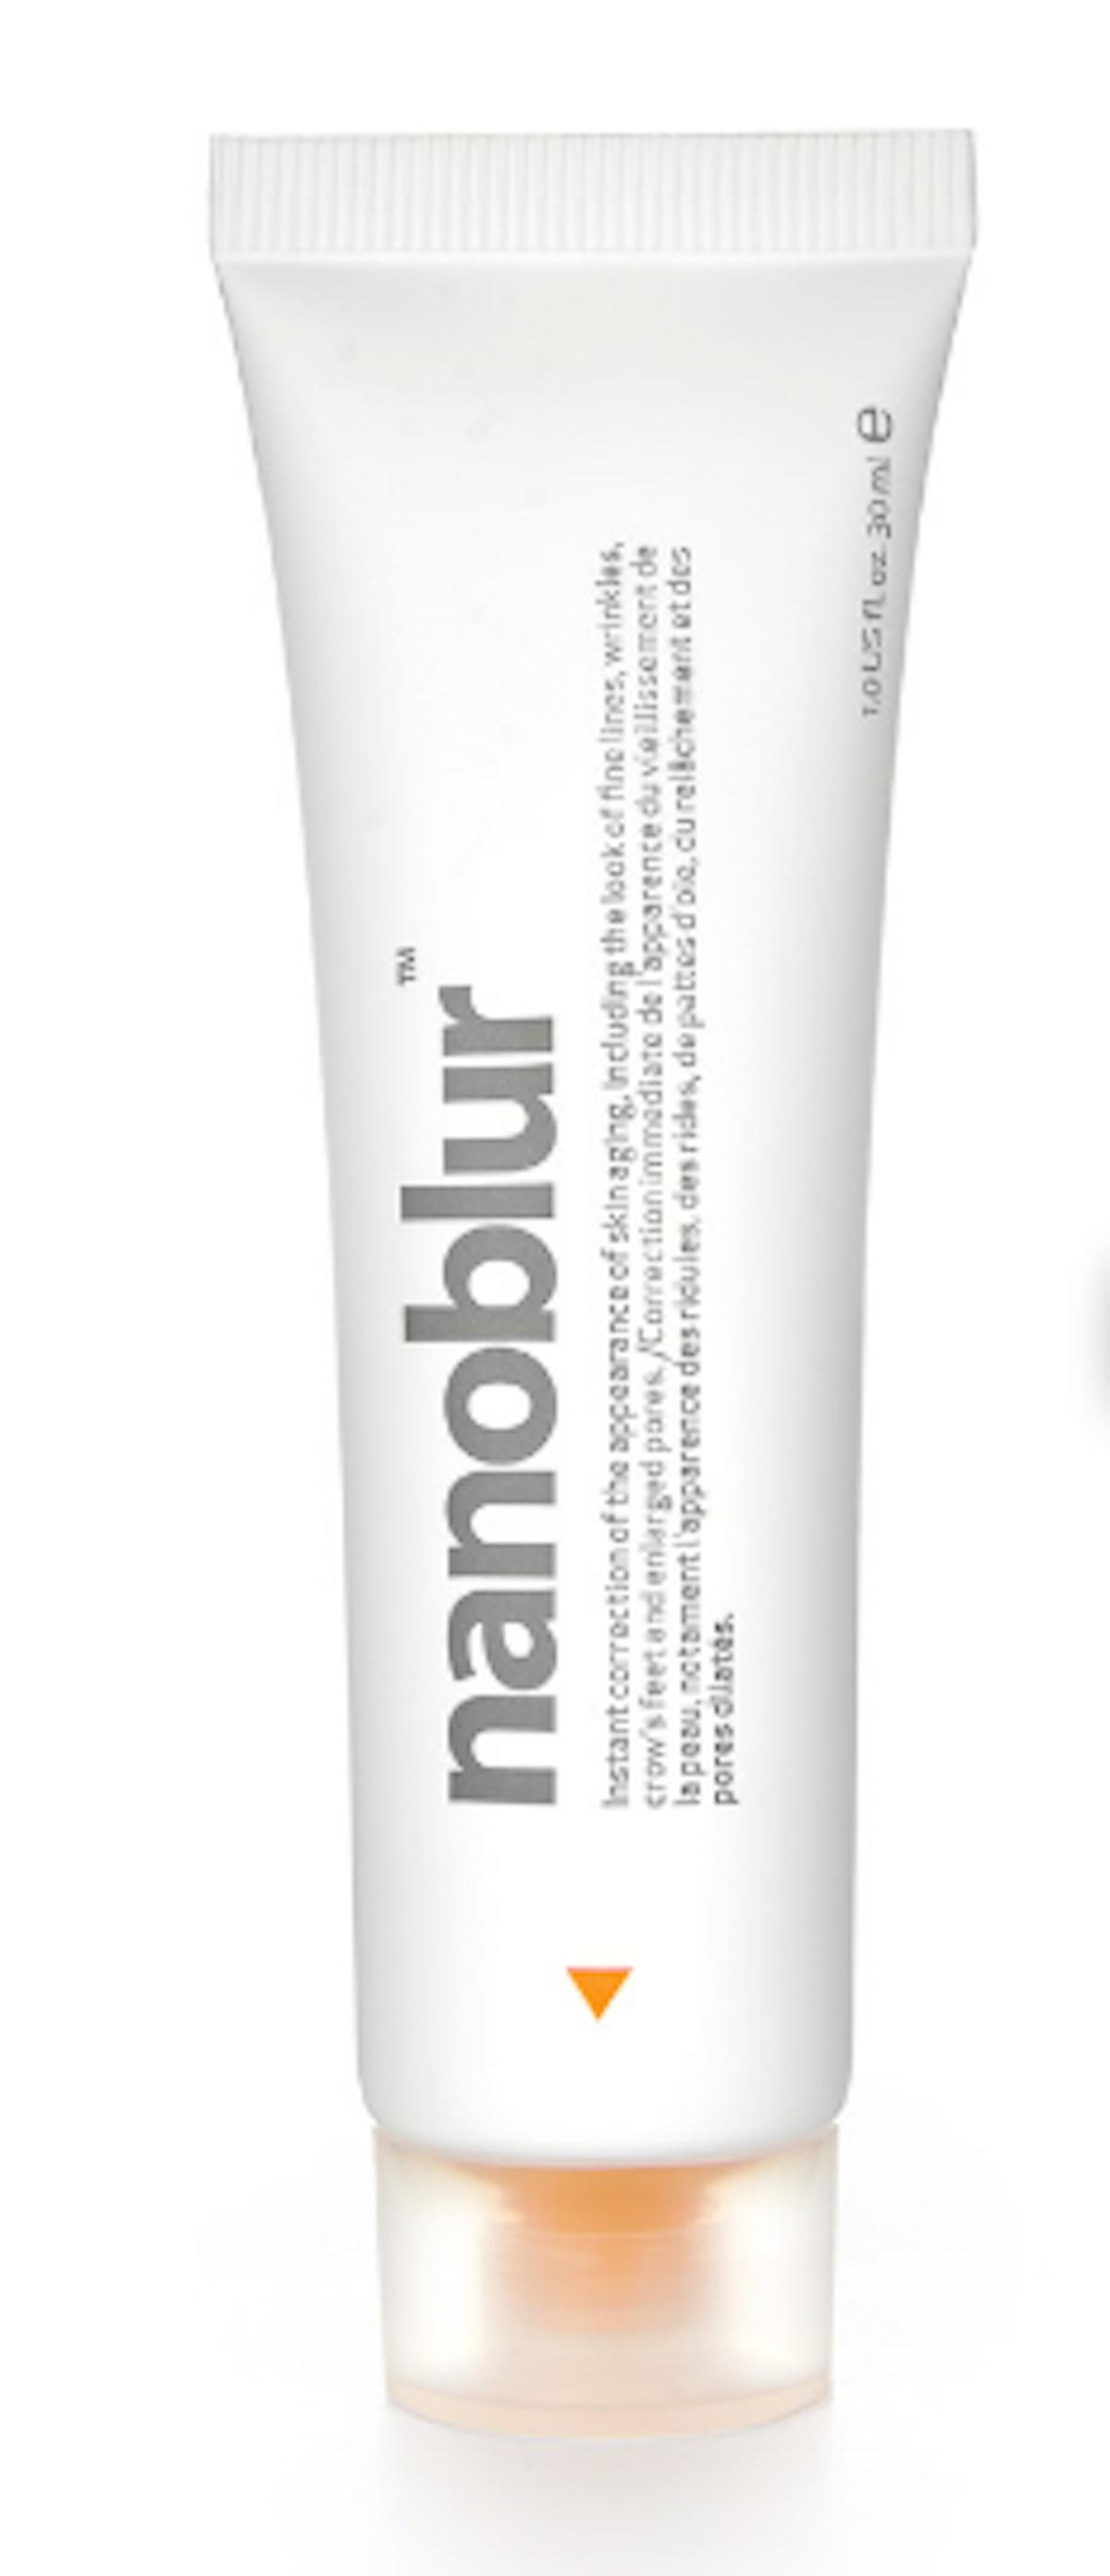 Nanoblur Instant Skin Blurring Cream